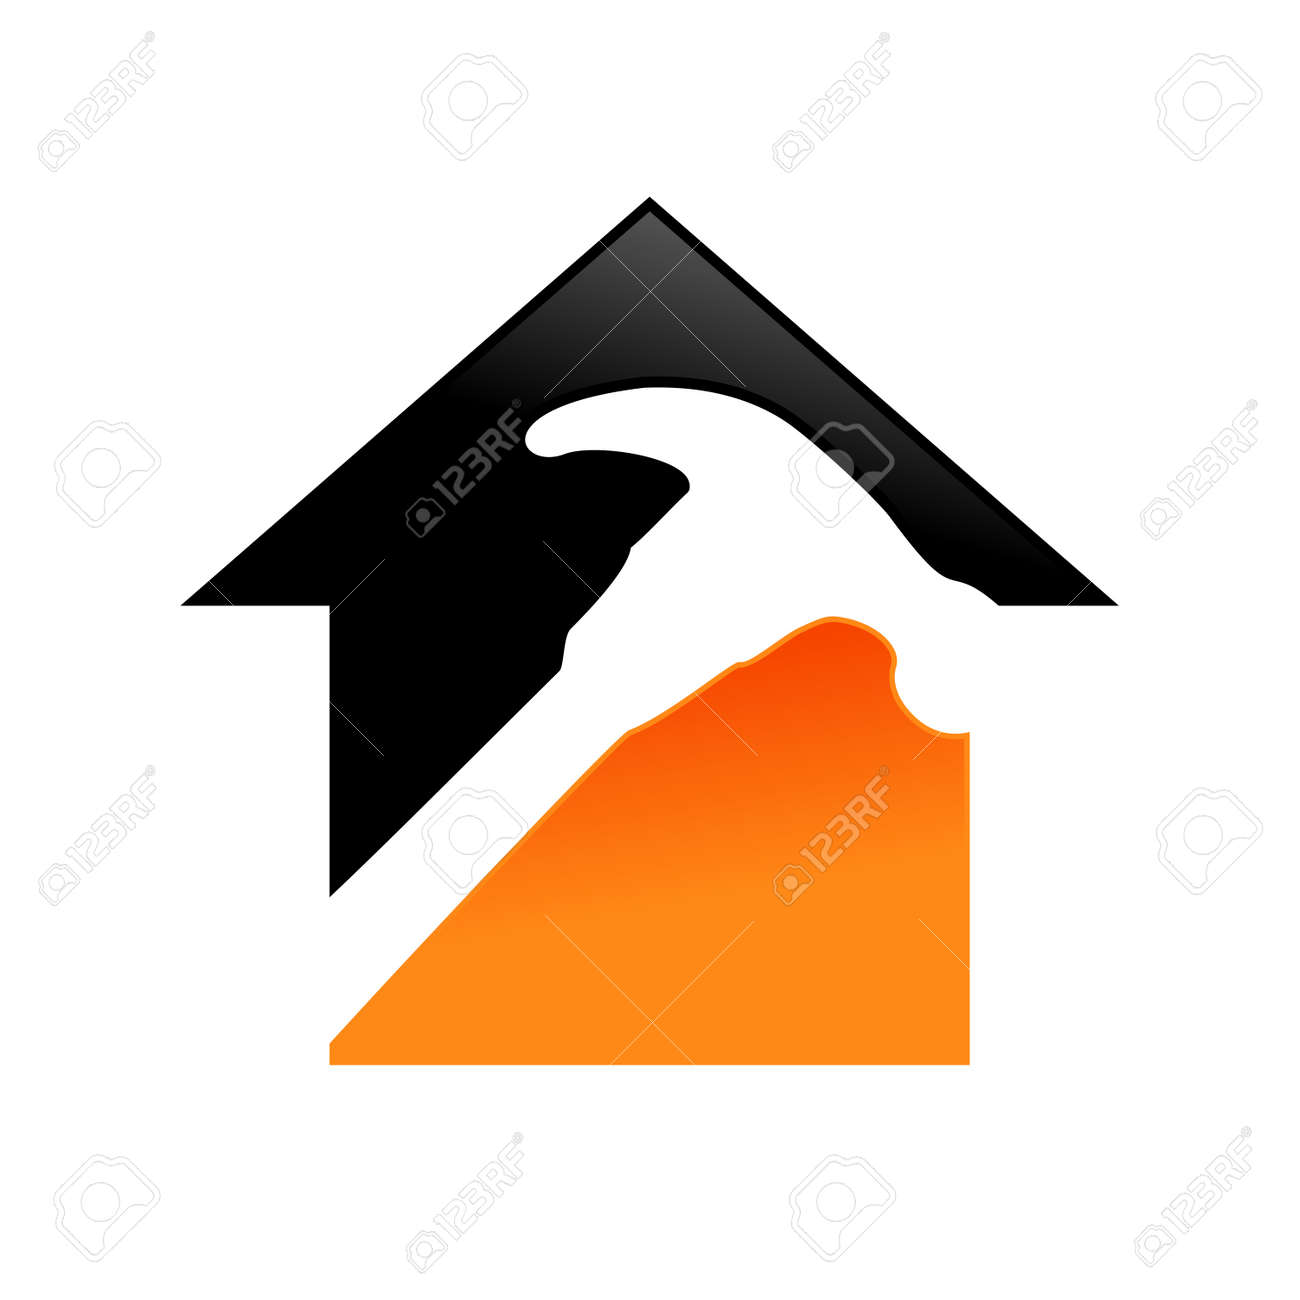 Home Repair Service Vector Symbol Graphic Logo Design Template - 105623138